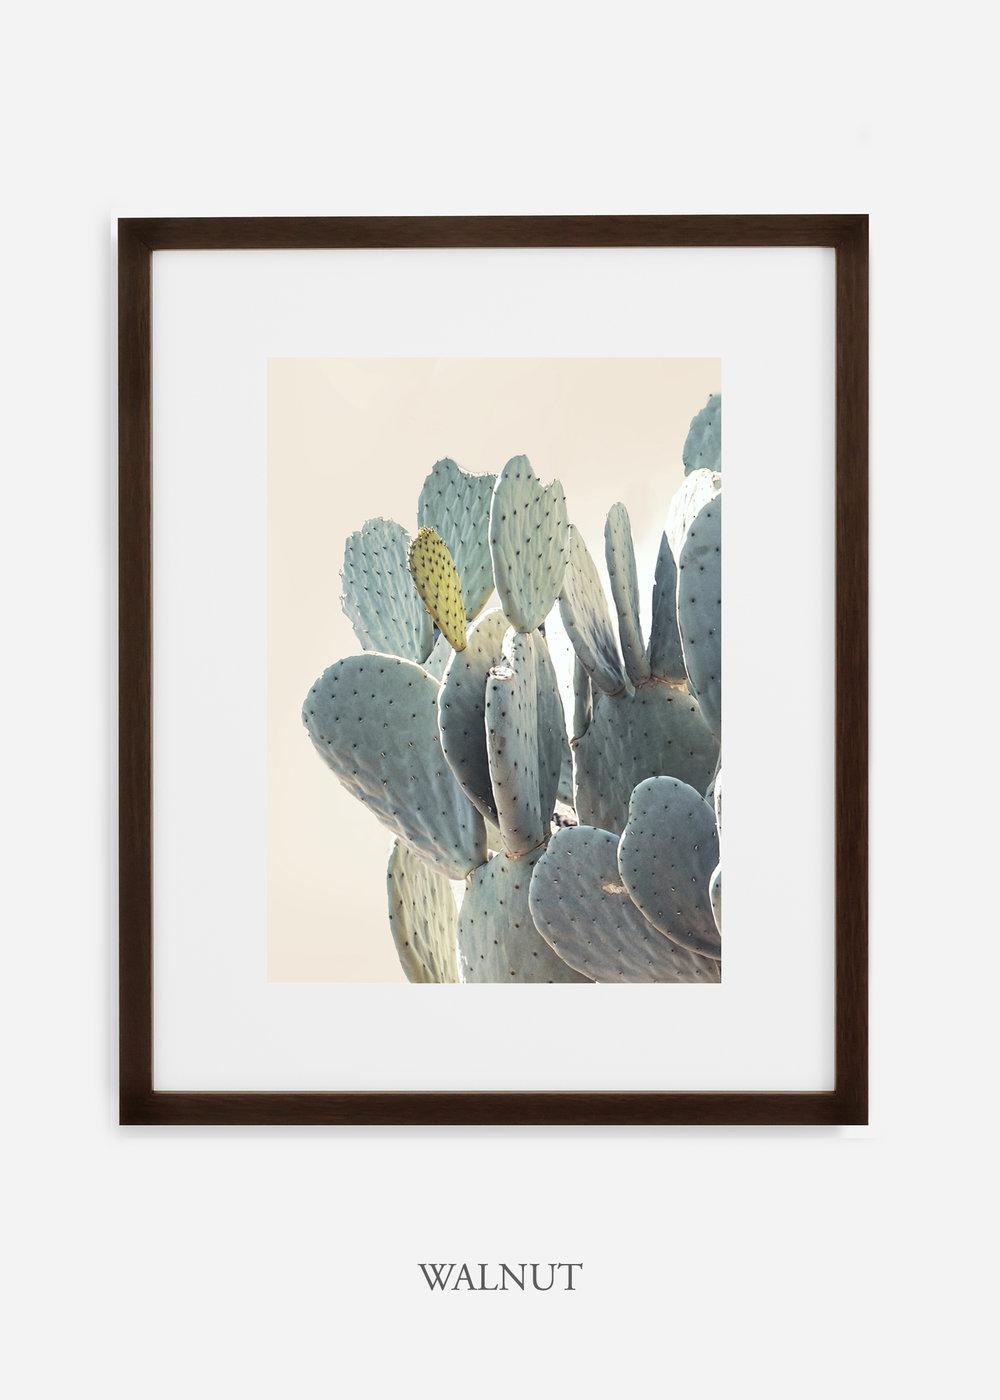 Desert_walnutframe_DesertDetails_Cactus__Art_Photography_interiordesign_bohemian_cactusart.jpg